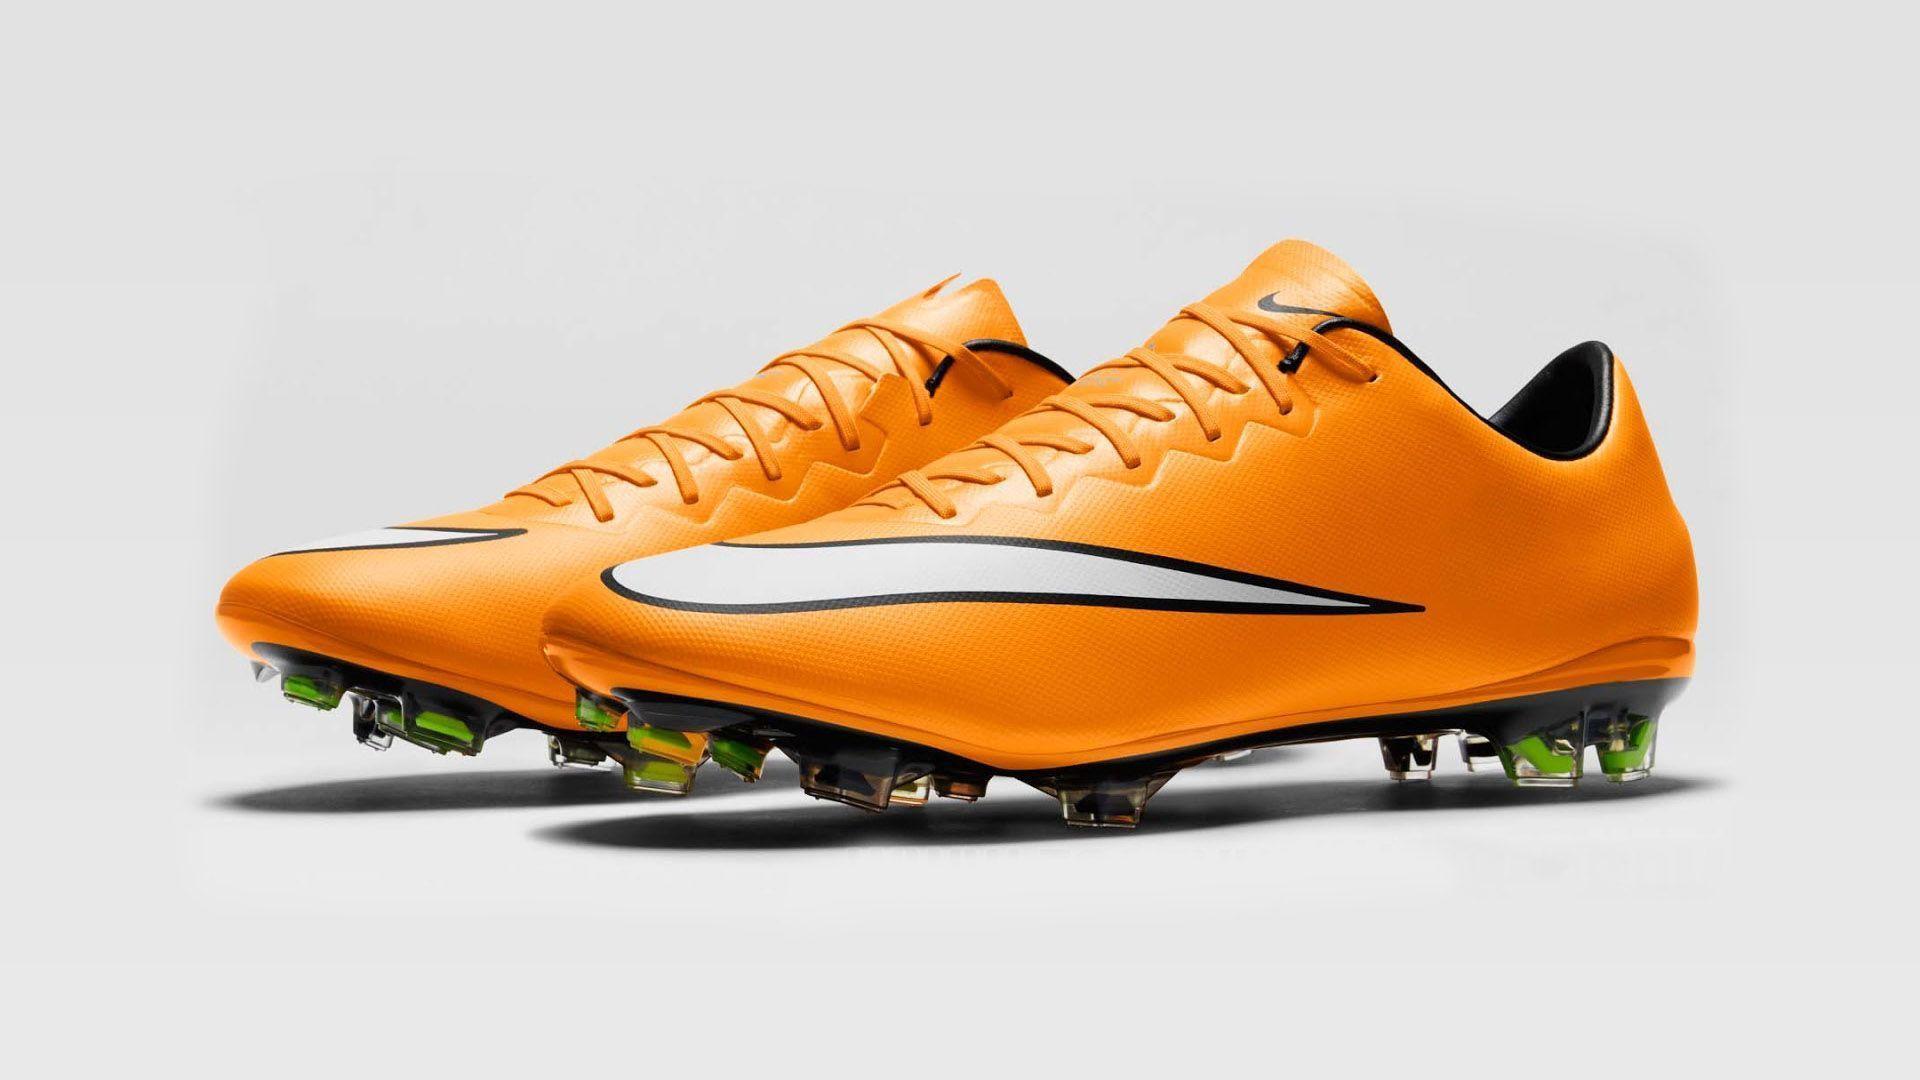 Mejores 100 Fondos De Nike: Nike Football Laser 2015 Wallpapers